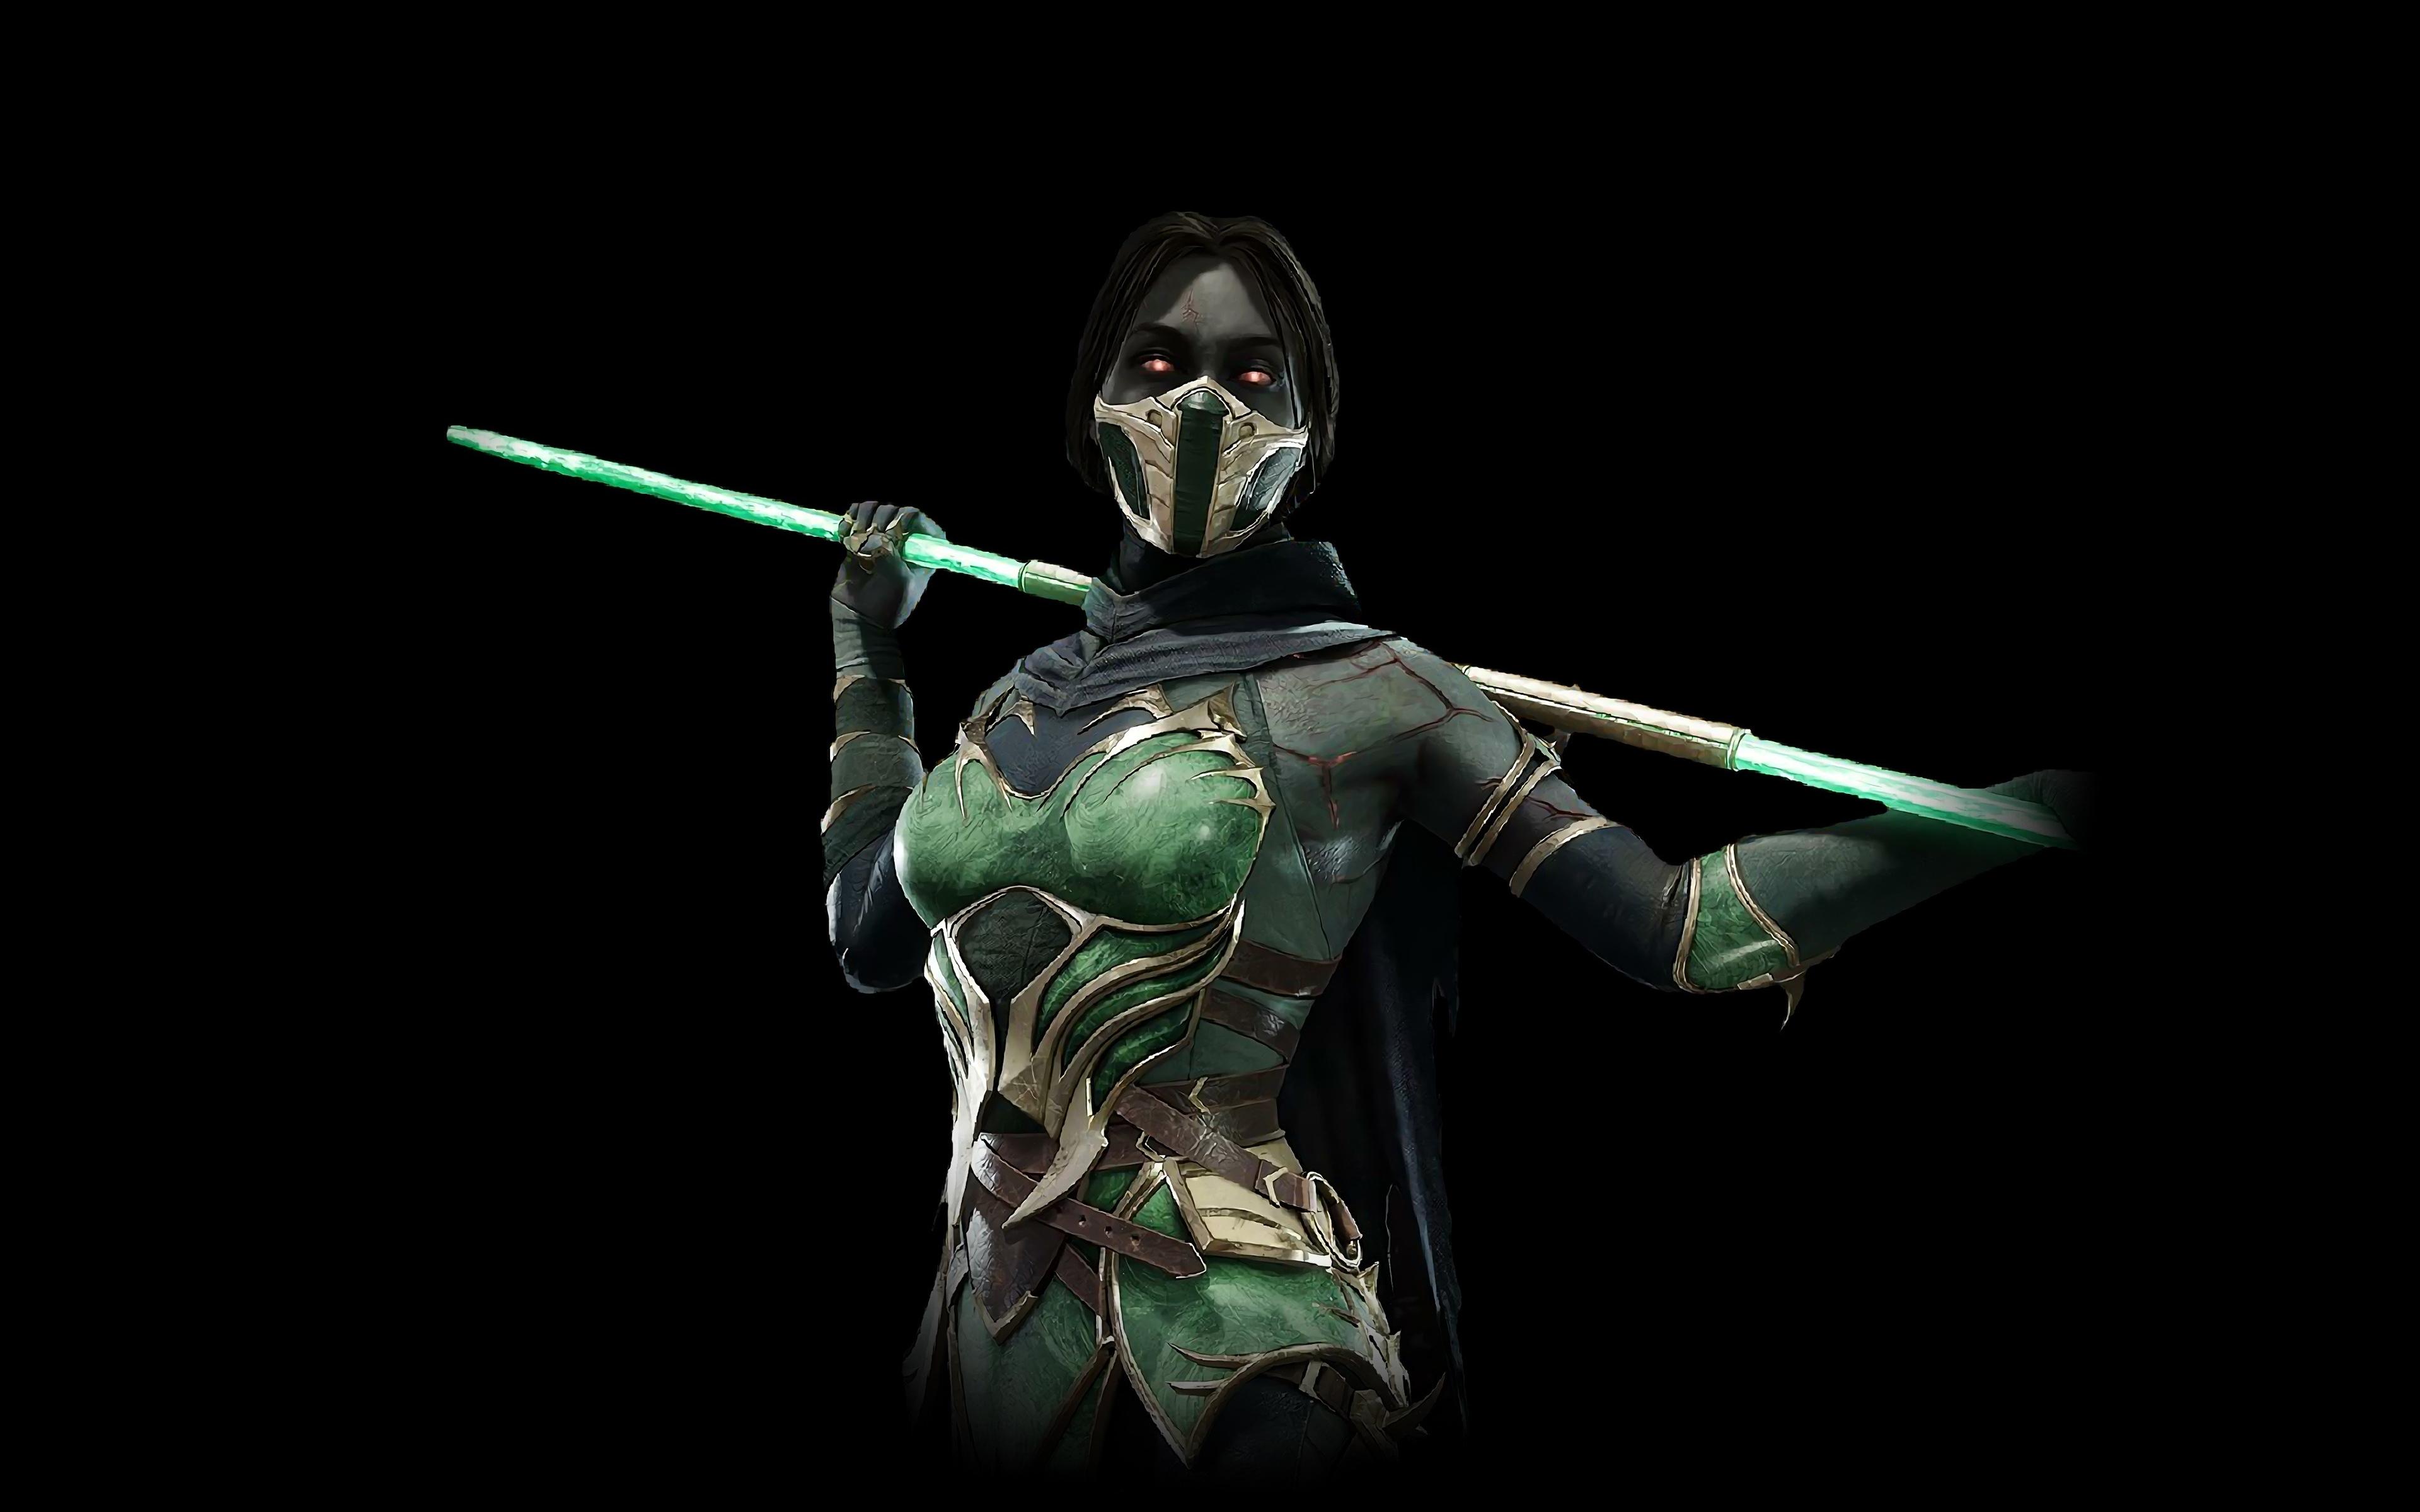 Download 3840x2400 Wallpaper Fighter K Jade Video Game Mortal